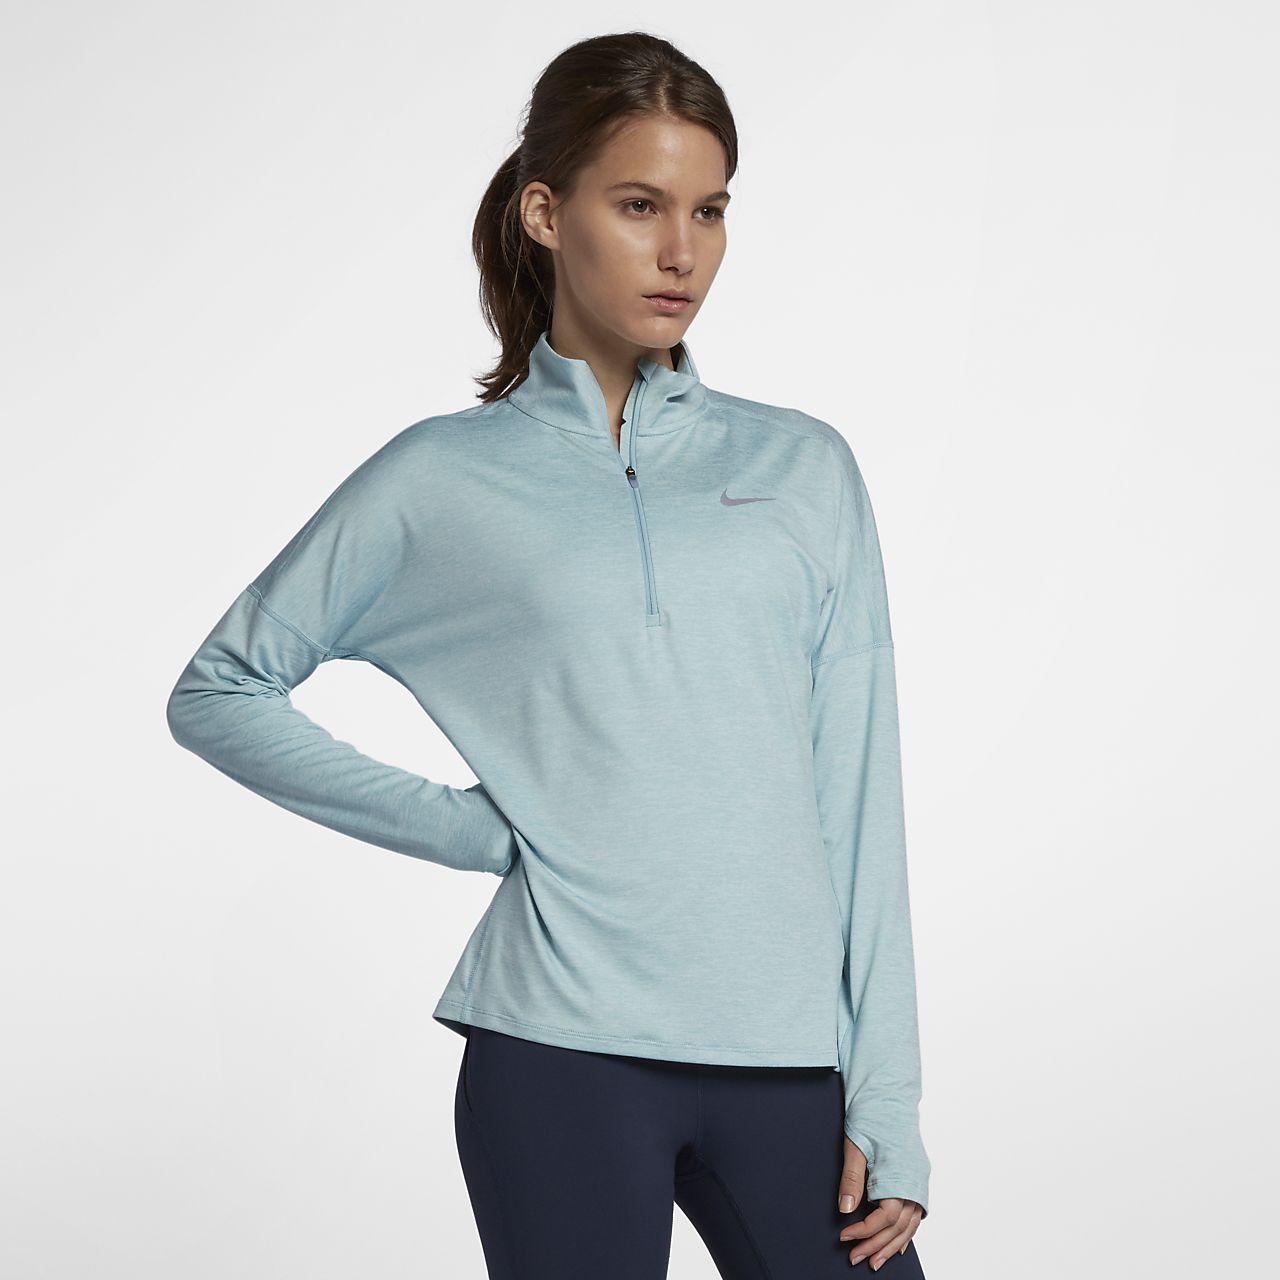 Nike Dri-FIT Women's Long-Sleeve Running Half-Zip Top